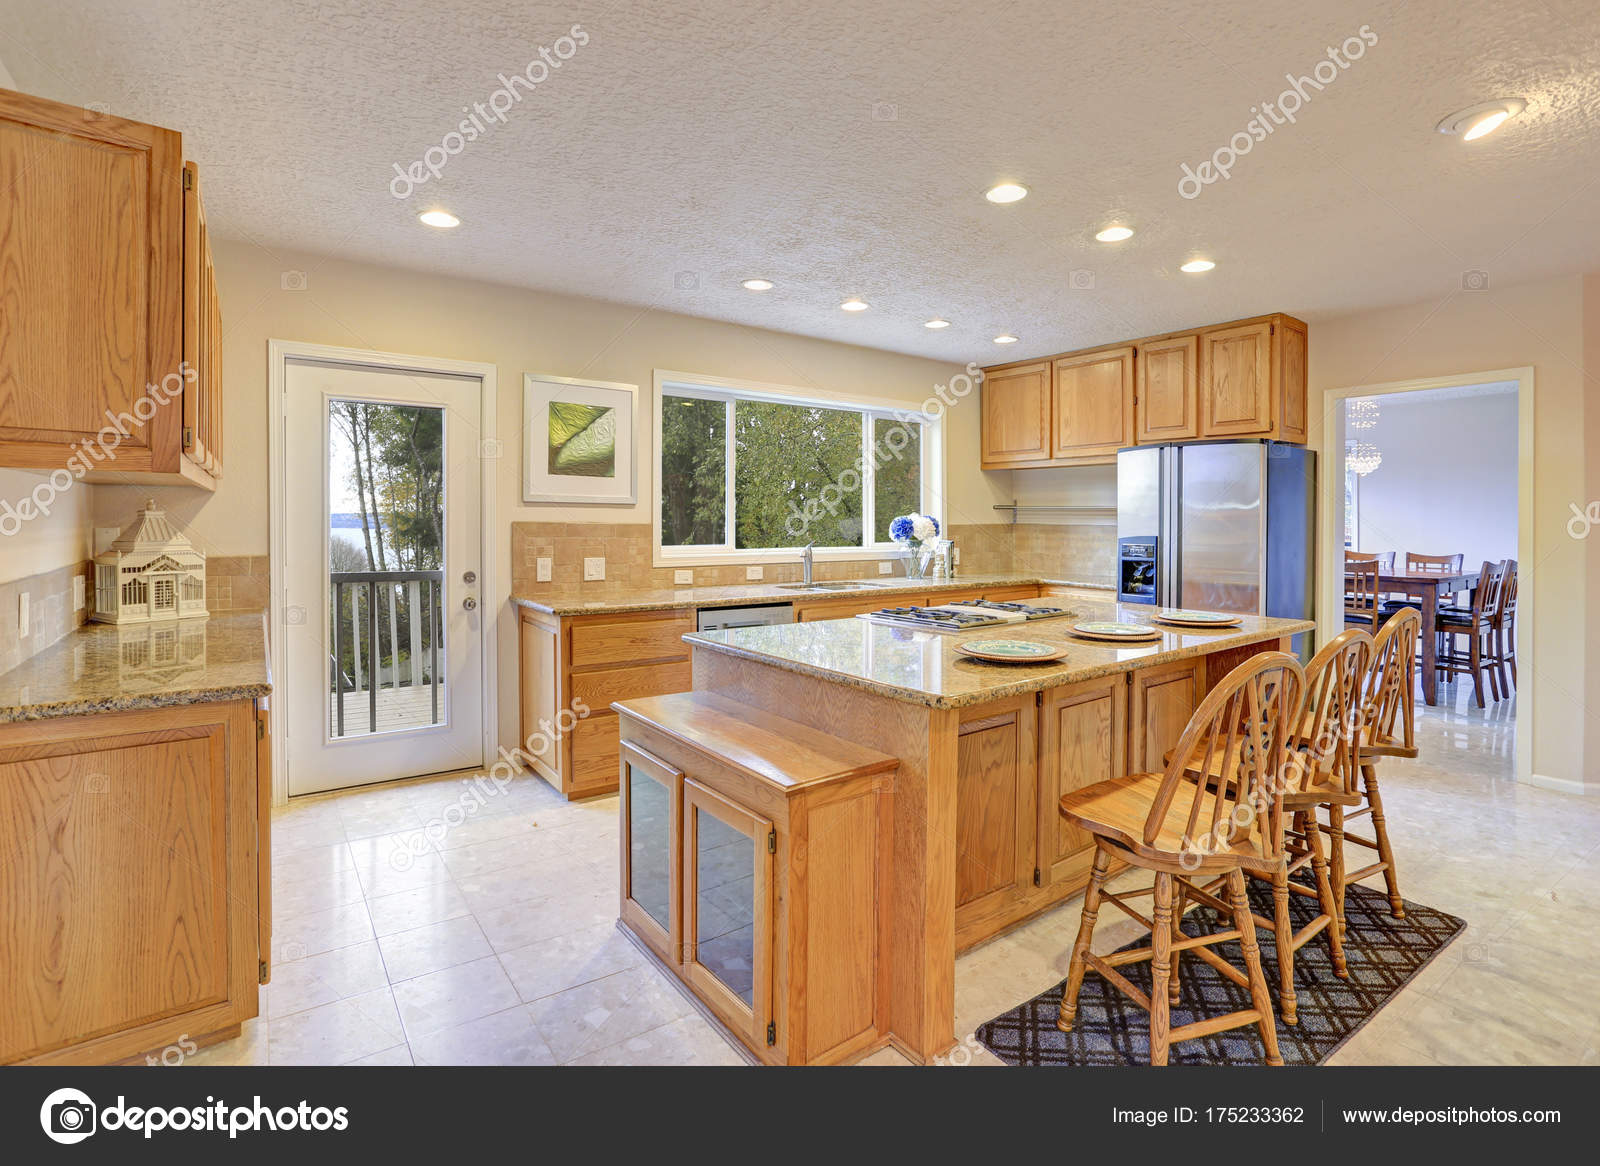 Daglicht Je Keuken : Gerenoveerd daglicht keuken met houten keuken kasten u2014 stockfoto